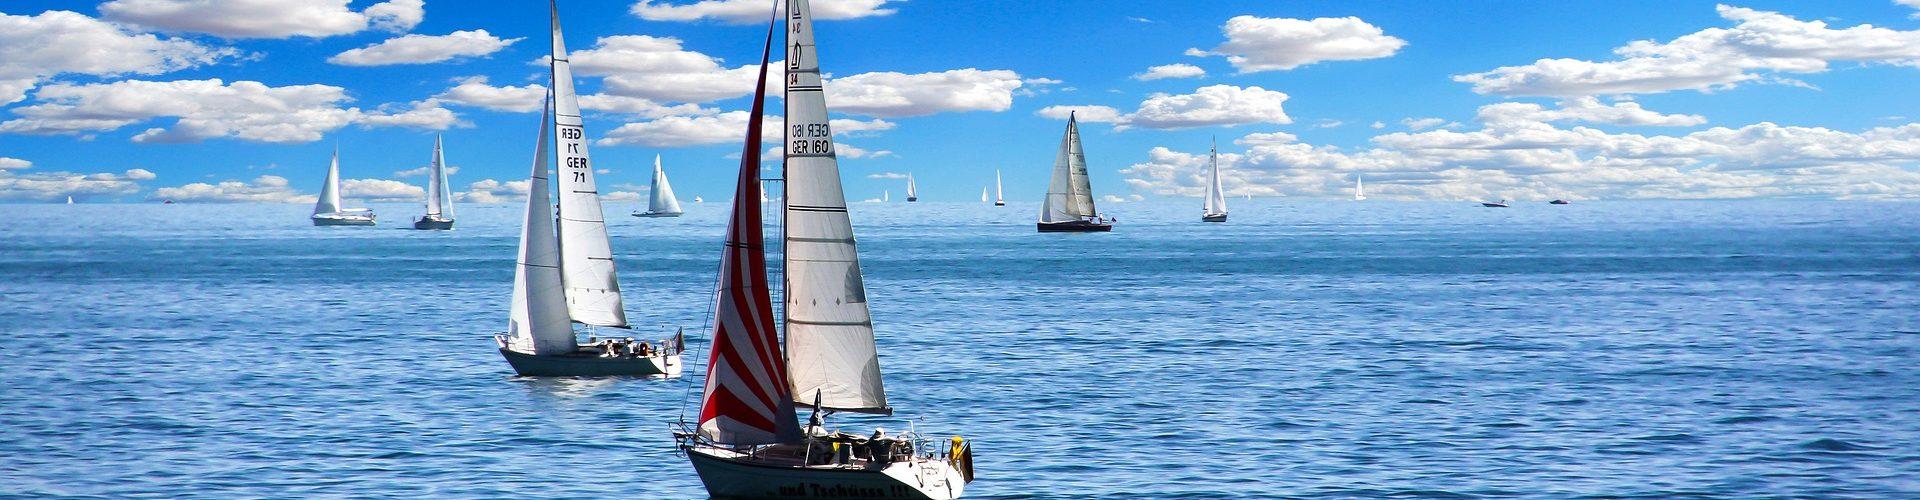 segeln lernen in Backnang segelschein machen in Backnang 1920x500 - Segeln lernen in Backnang